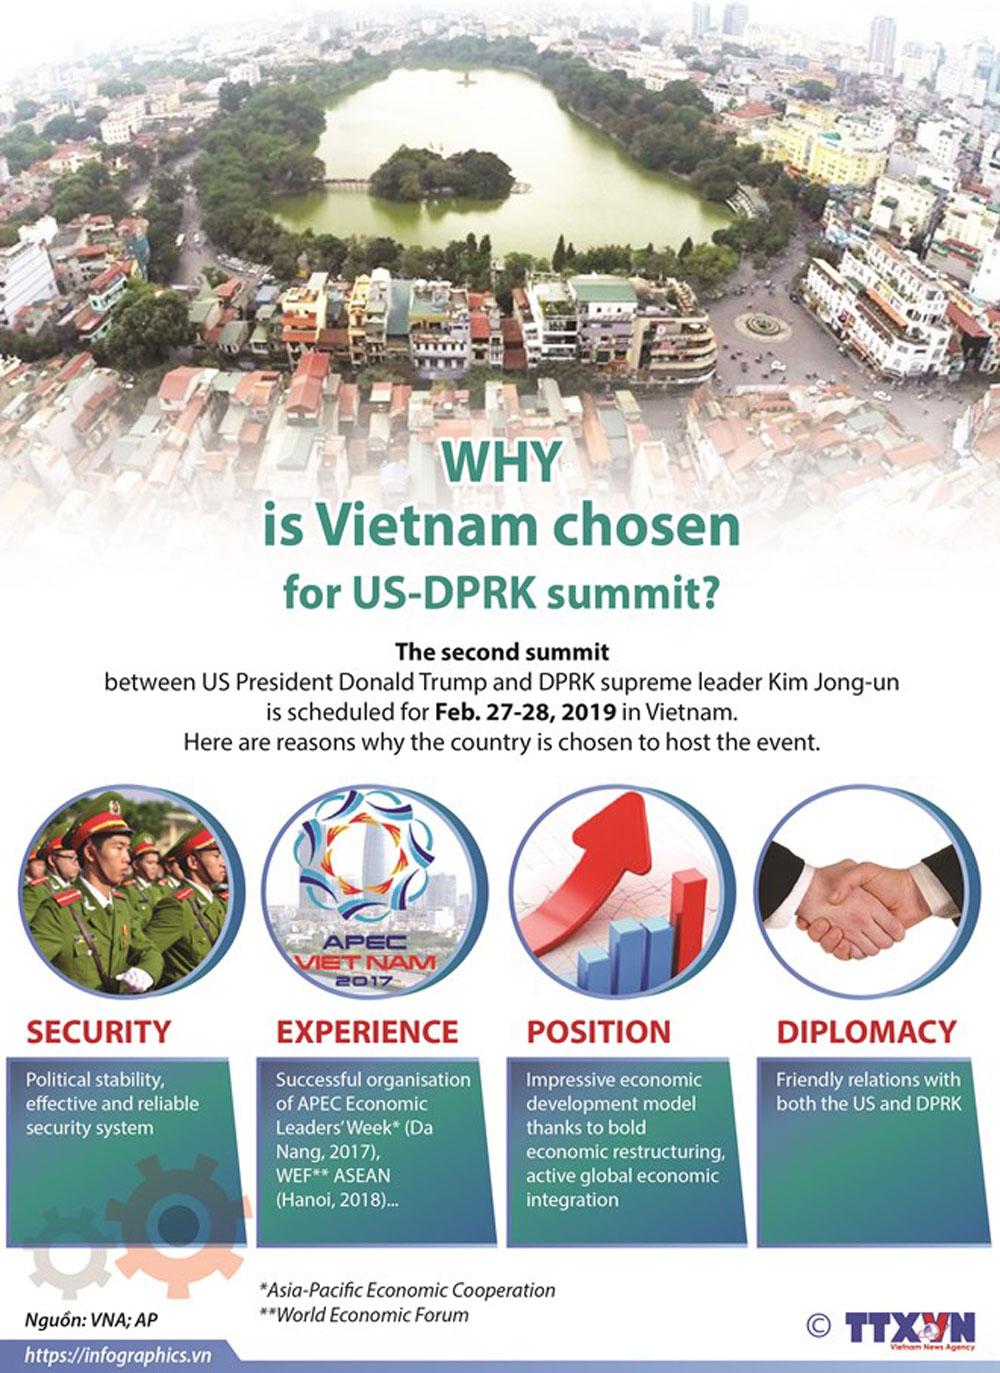 Vietnam, US-DPRK summit, Donald Trump, Kim Jung un, security, experience, position, diplomacy